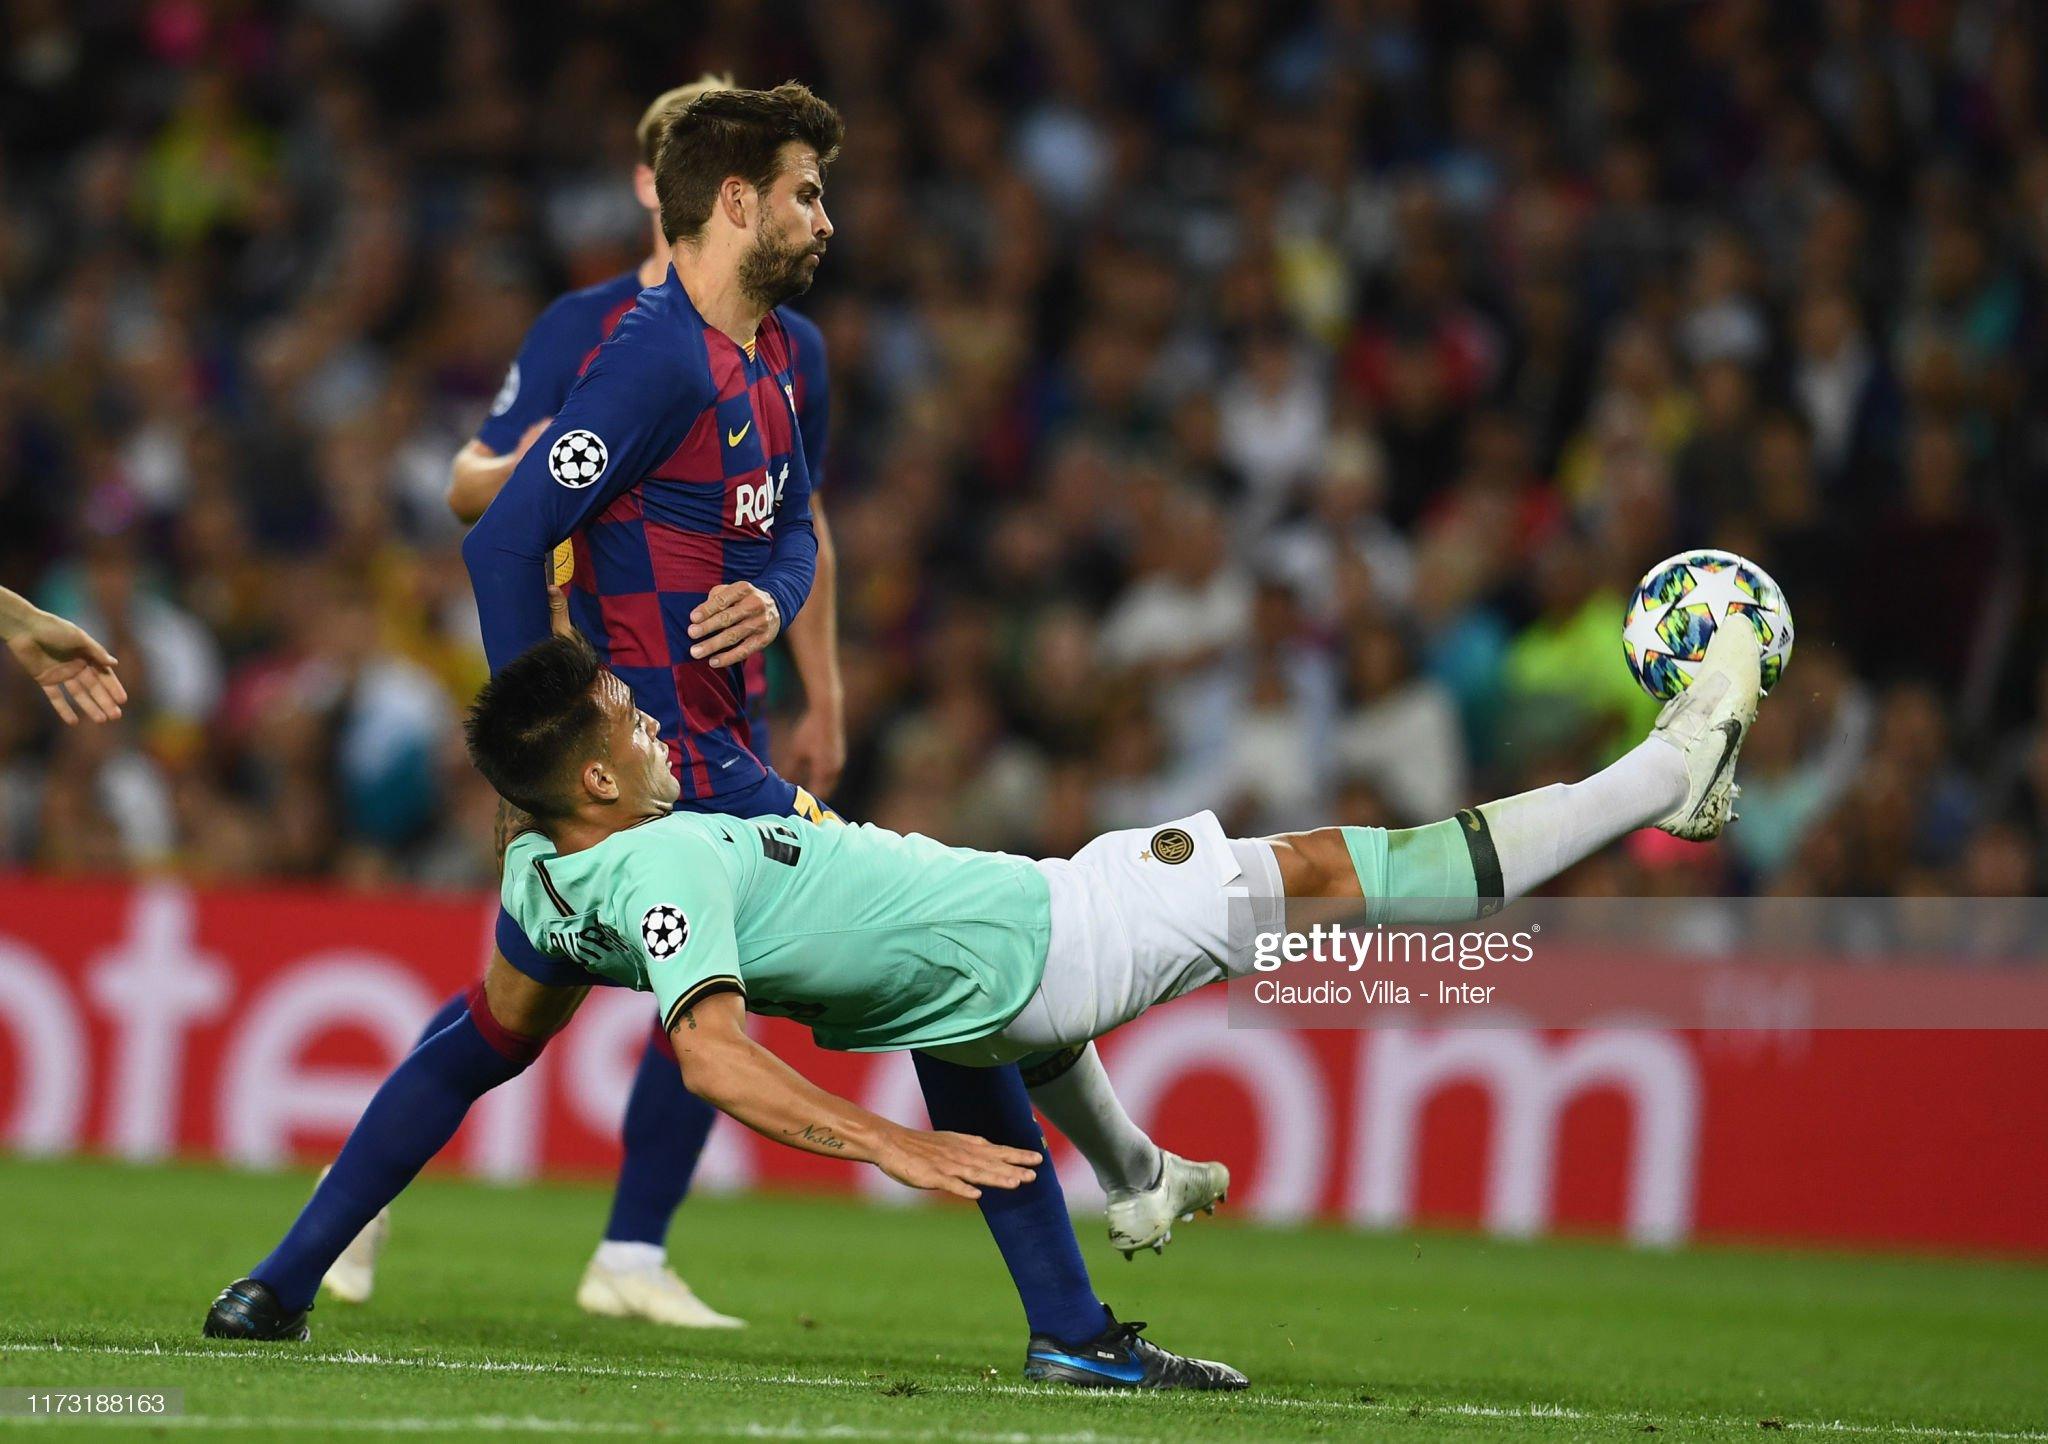 صور مباراة : برشلونة - إنتر 2-1 ( 02-10-2019 )  Lautaro-martnez-of-fc-internazionale-in-action-during-the-uefa-f-picture-id1173188163?s=2048x2048